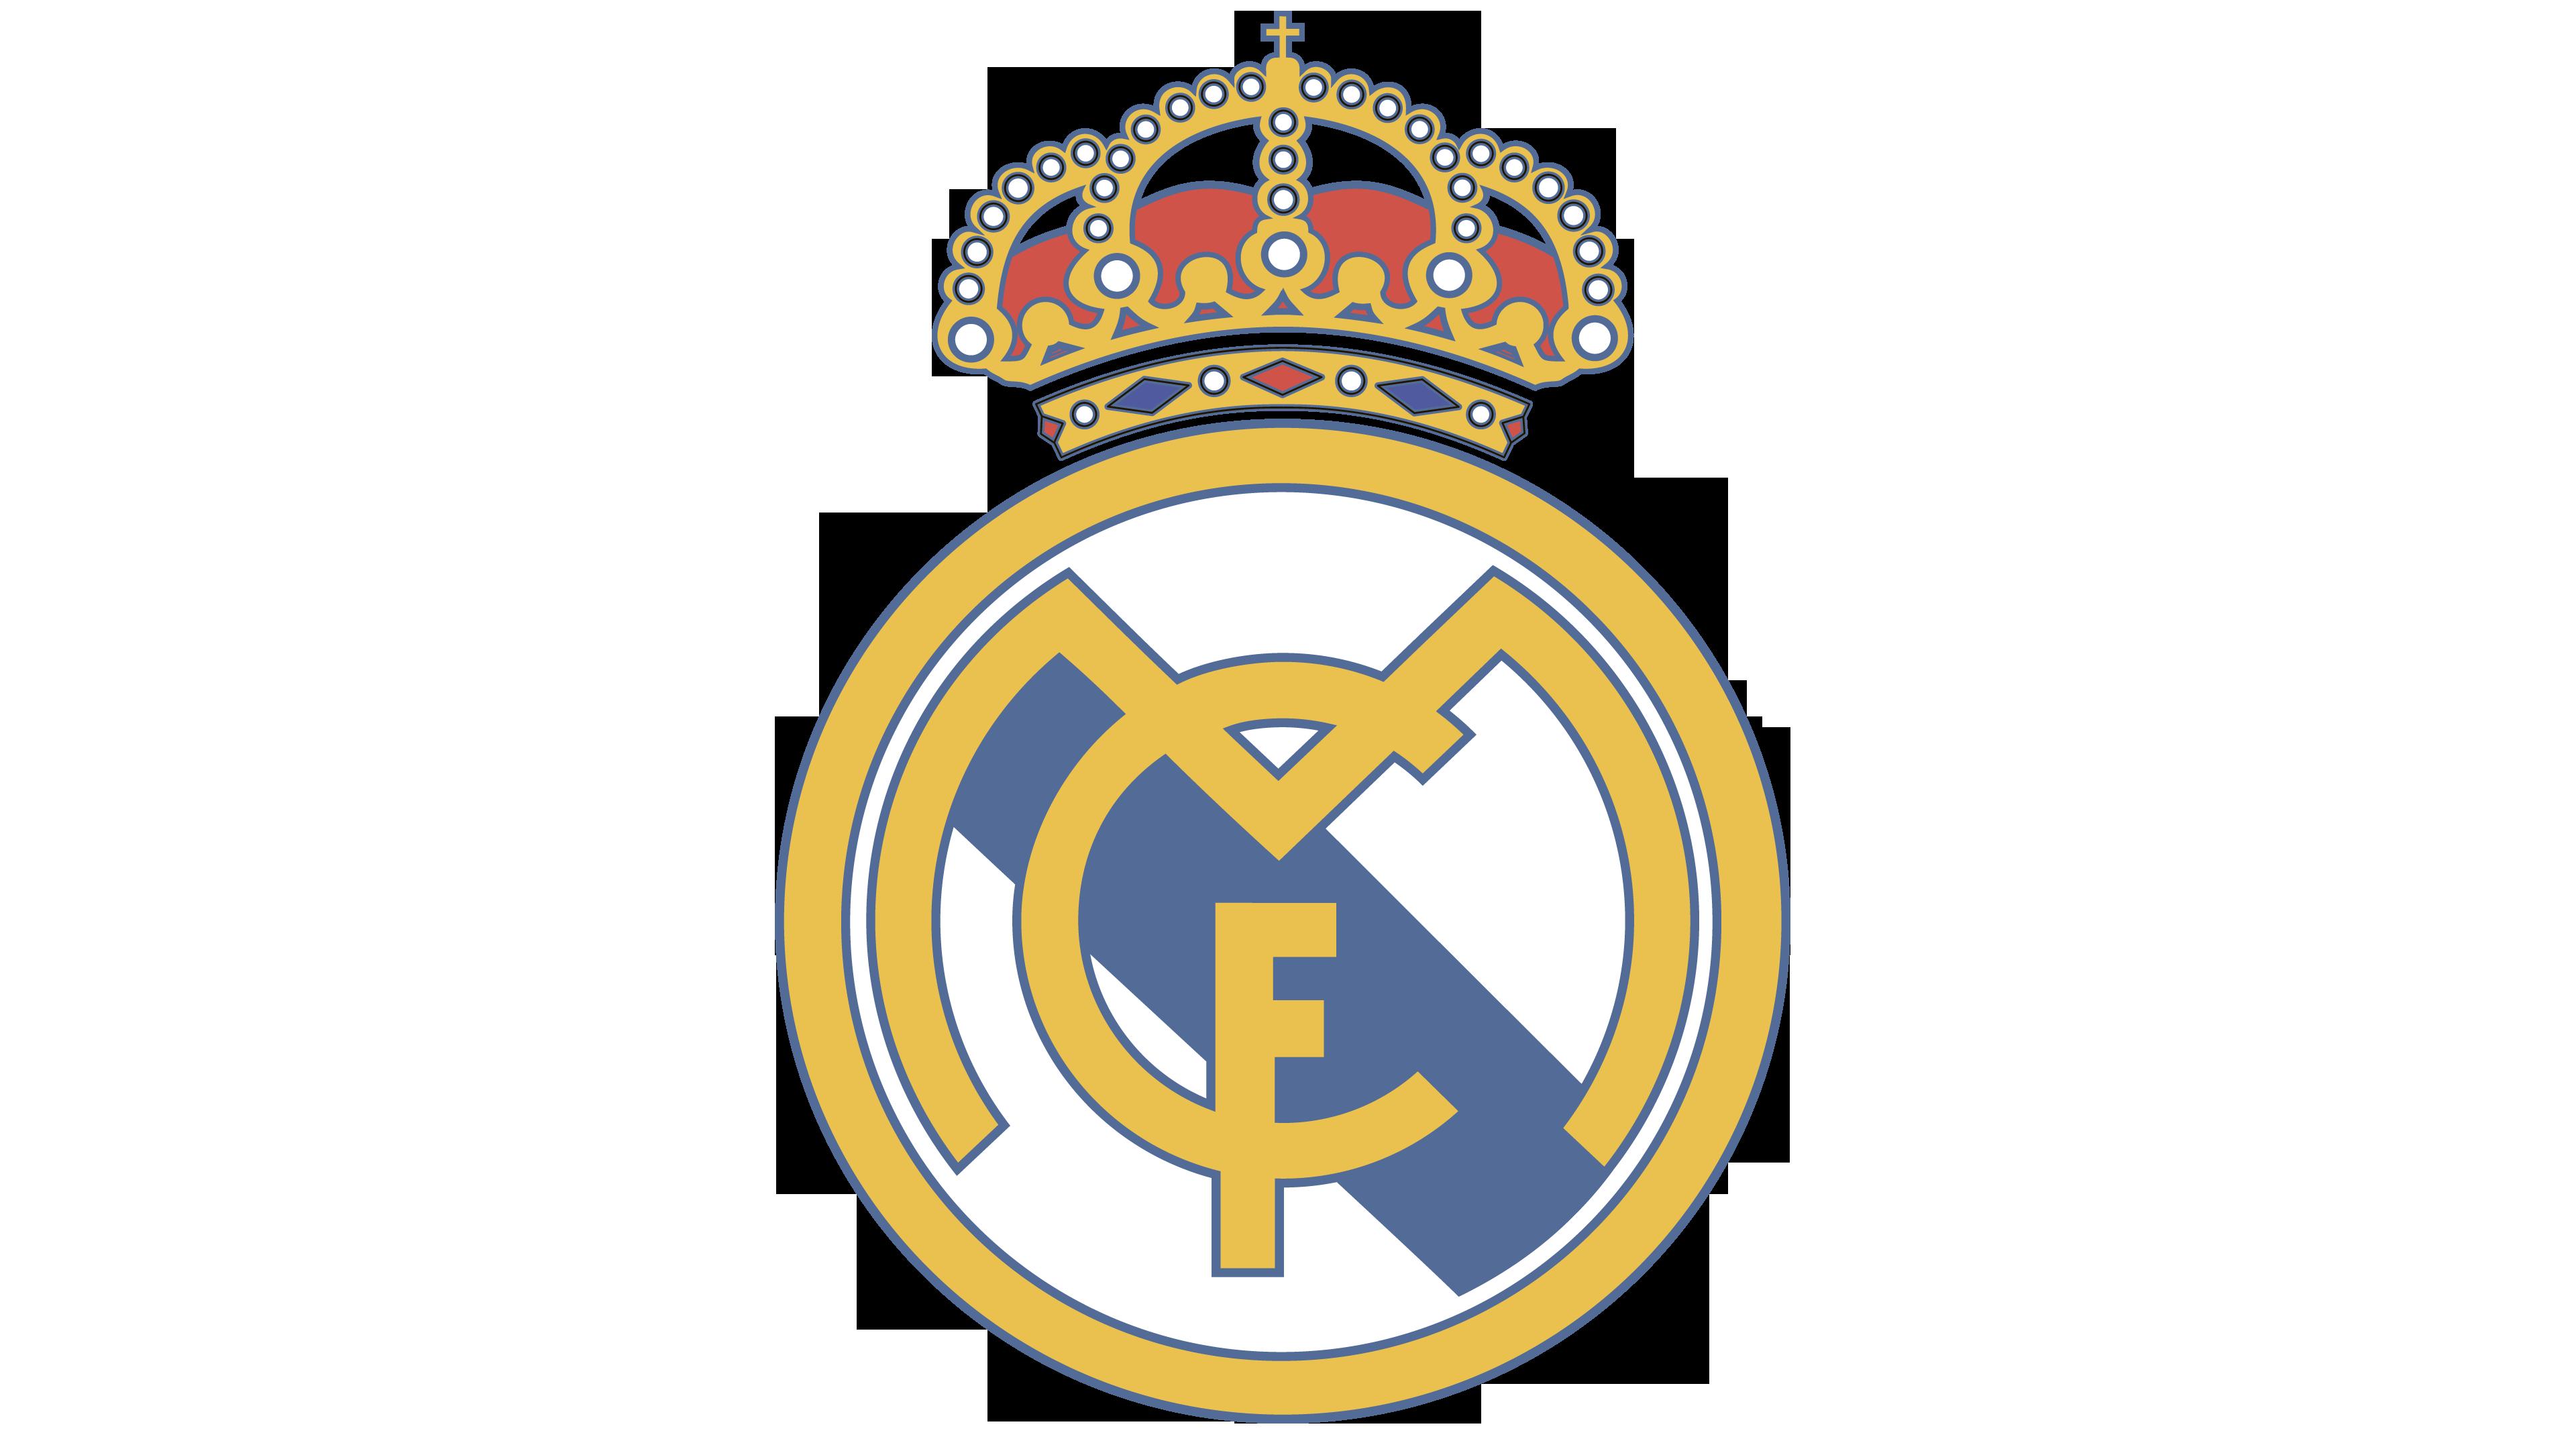 History clipart history symbol. Real madrid logo interesting